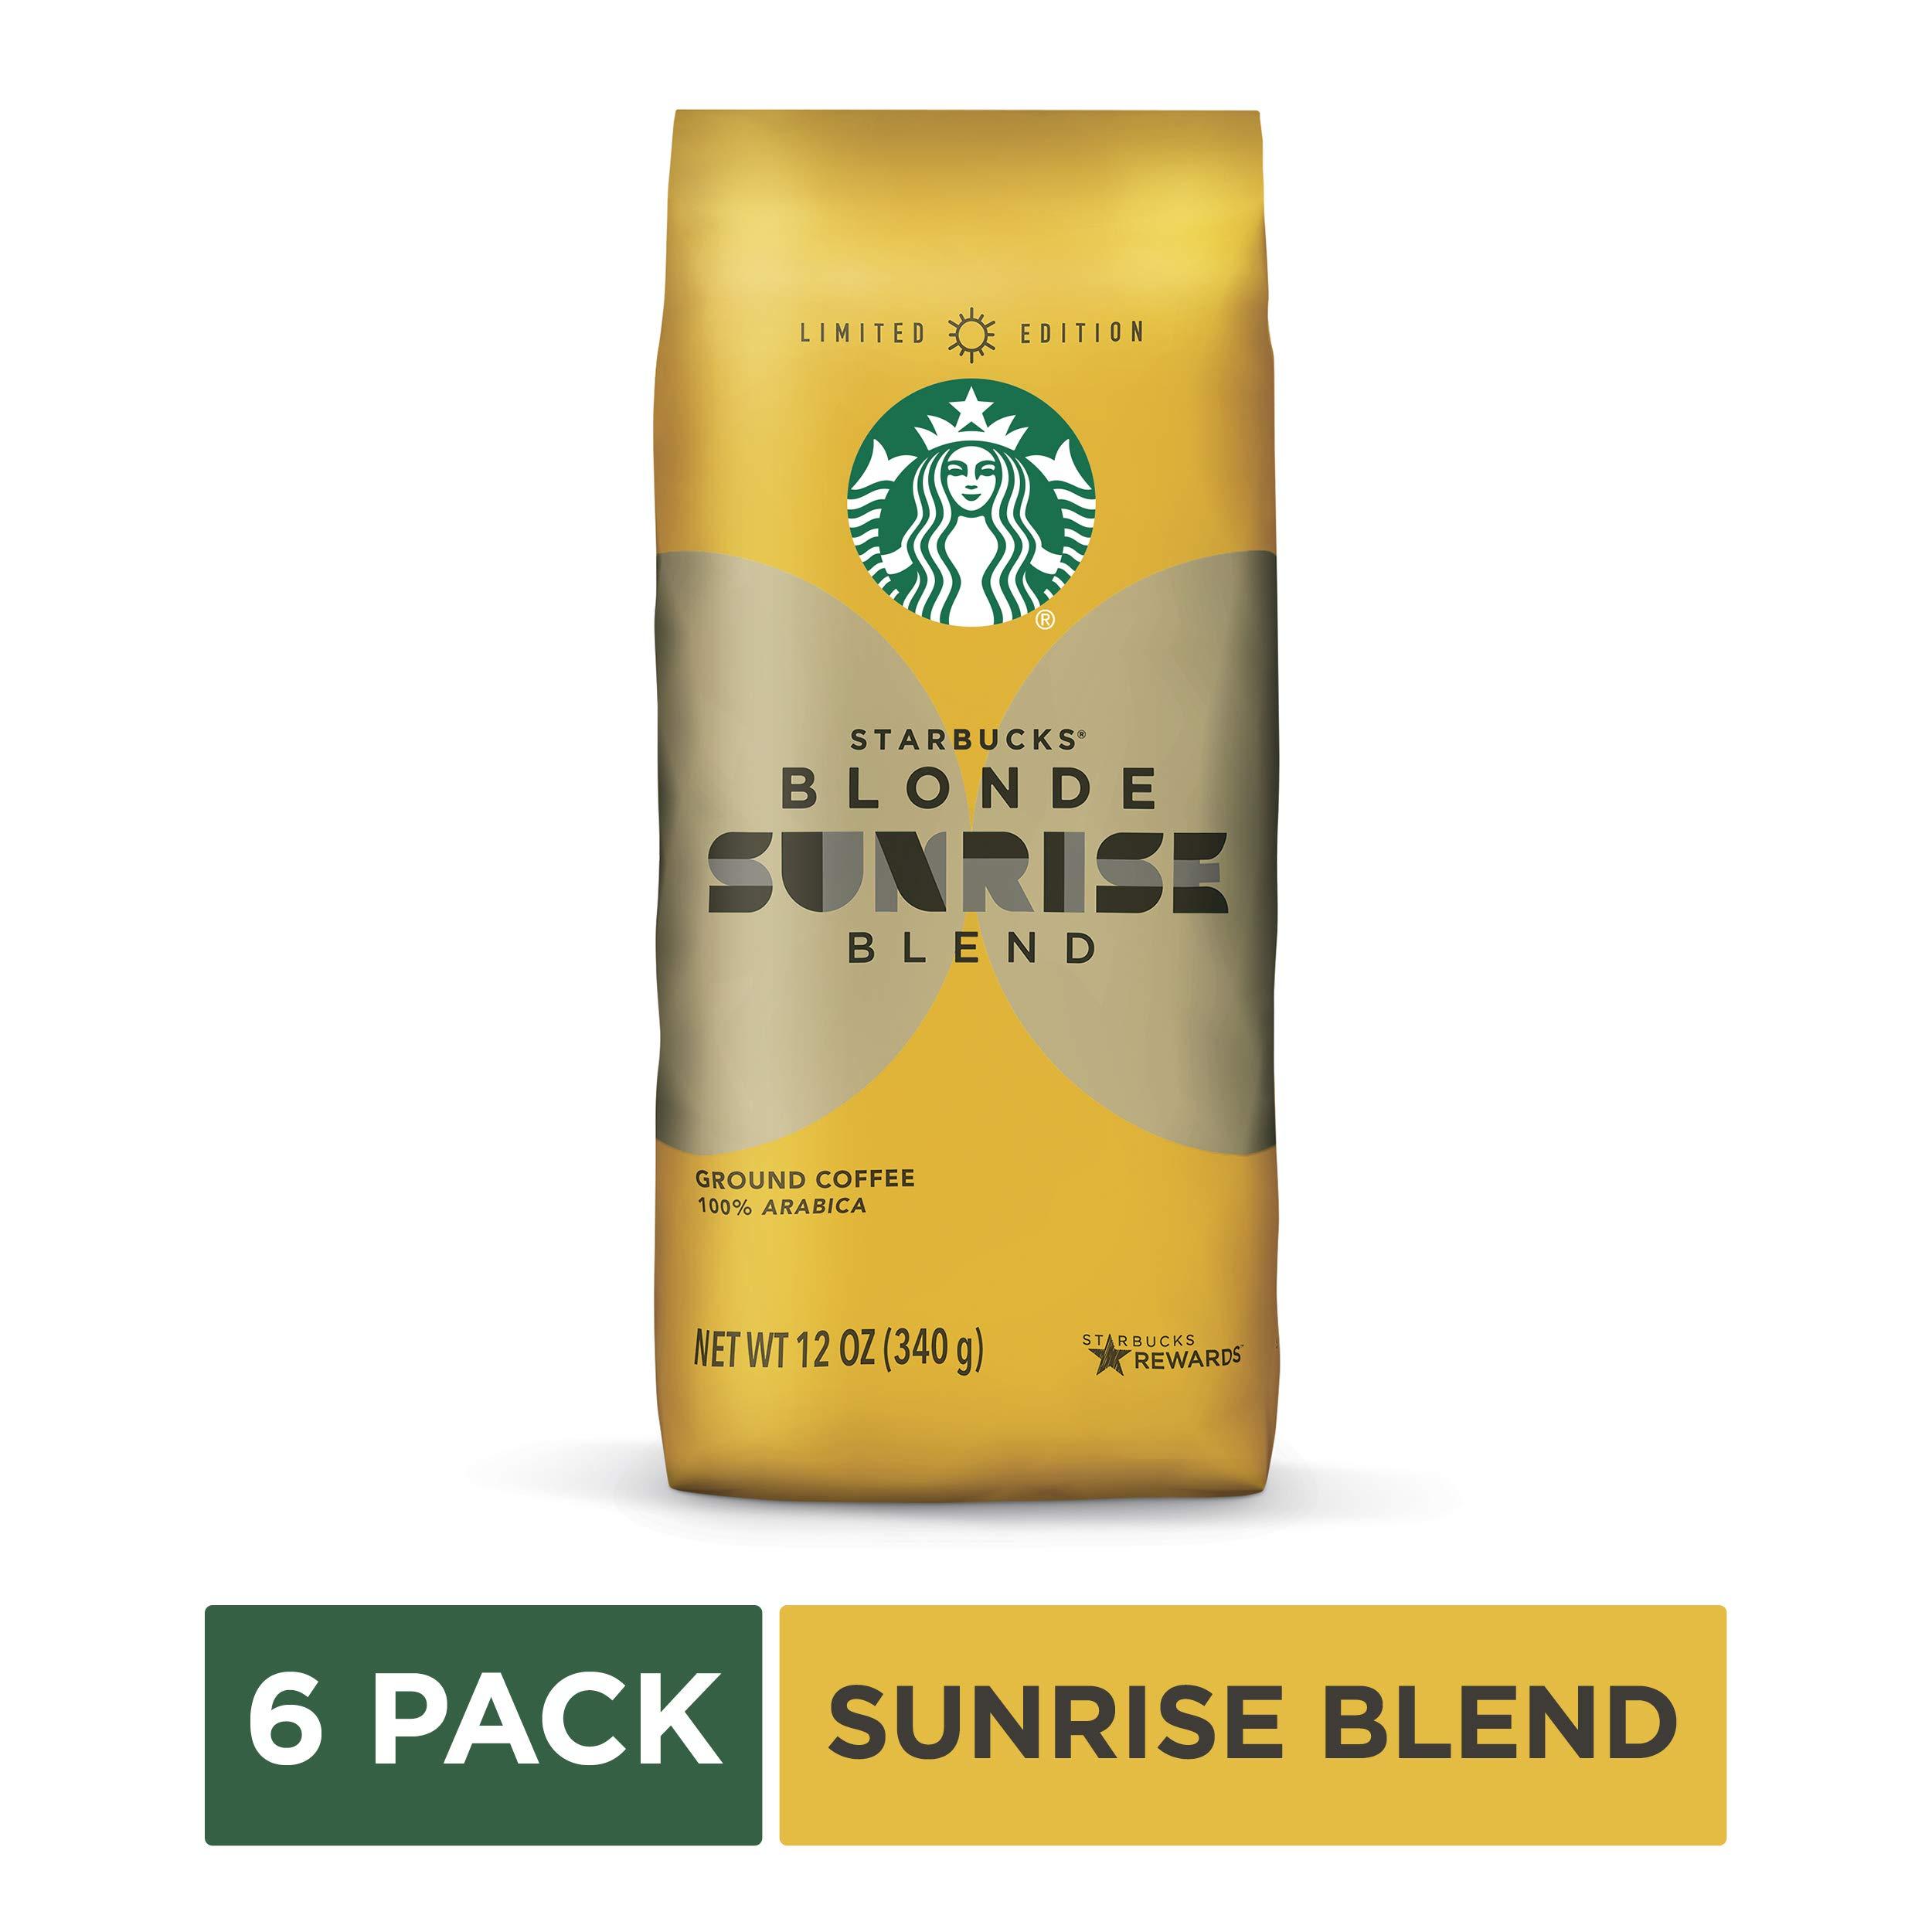 Starbucks Blonde Sunrise Blend Light Roast Ground Coffee, 6 12-oz. bags